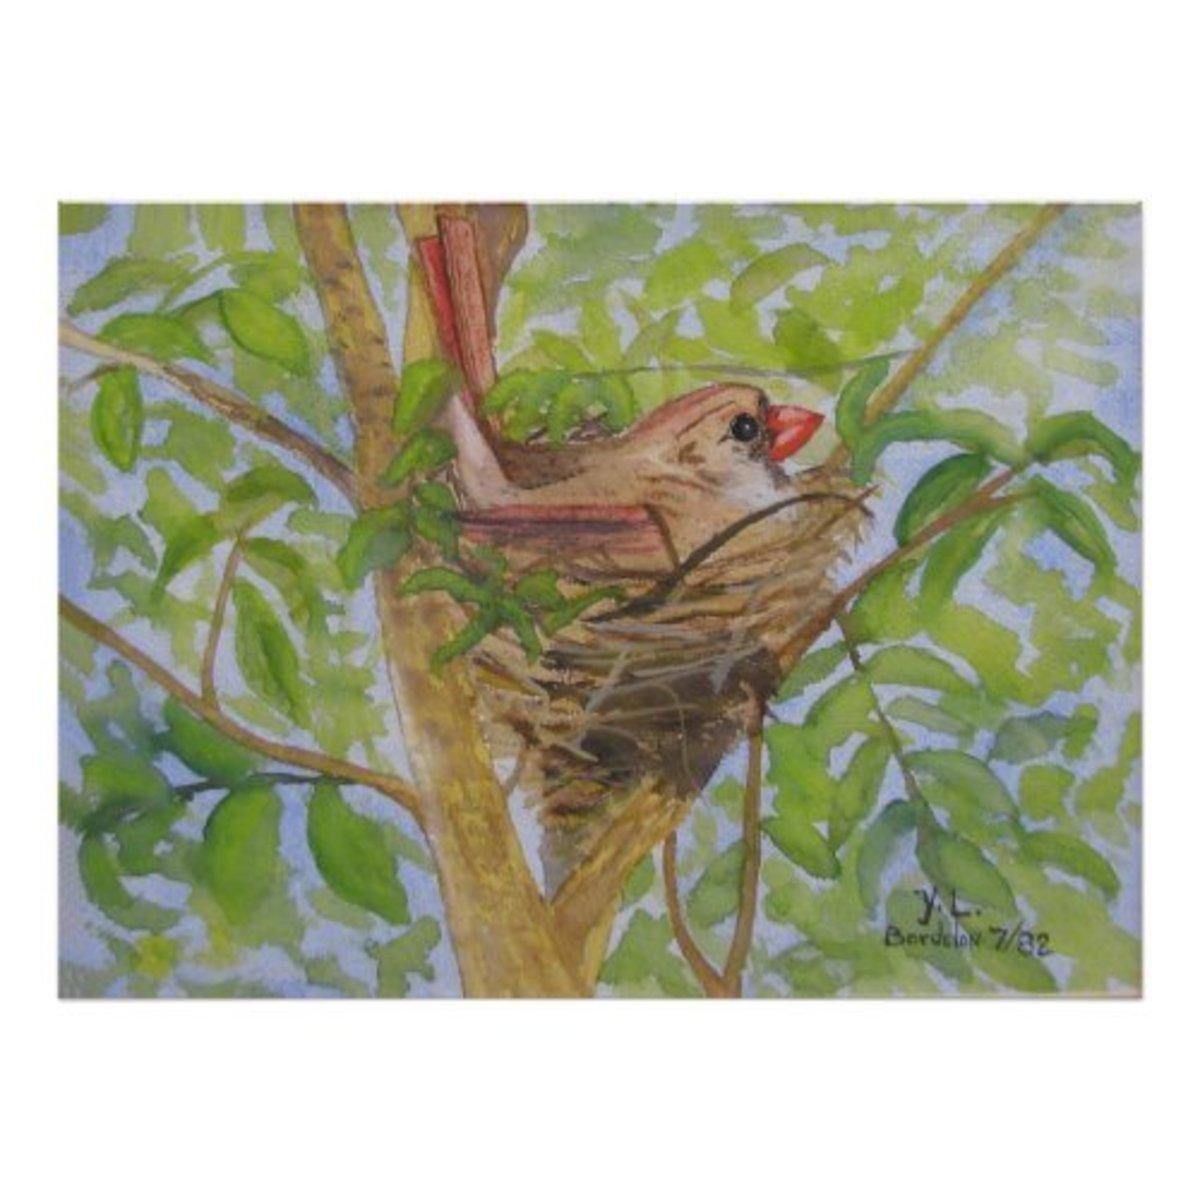 Mother Cardinal on nest